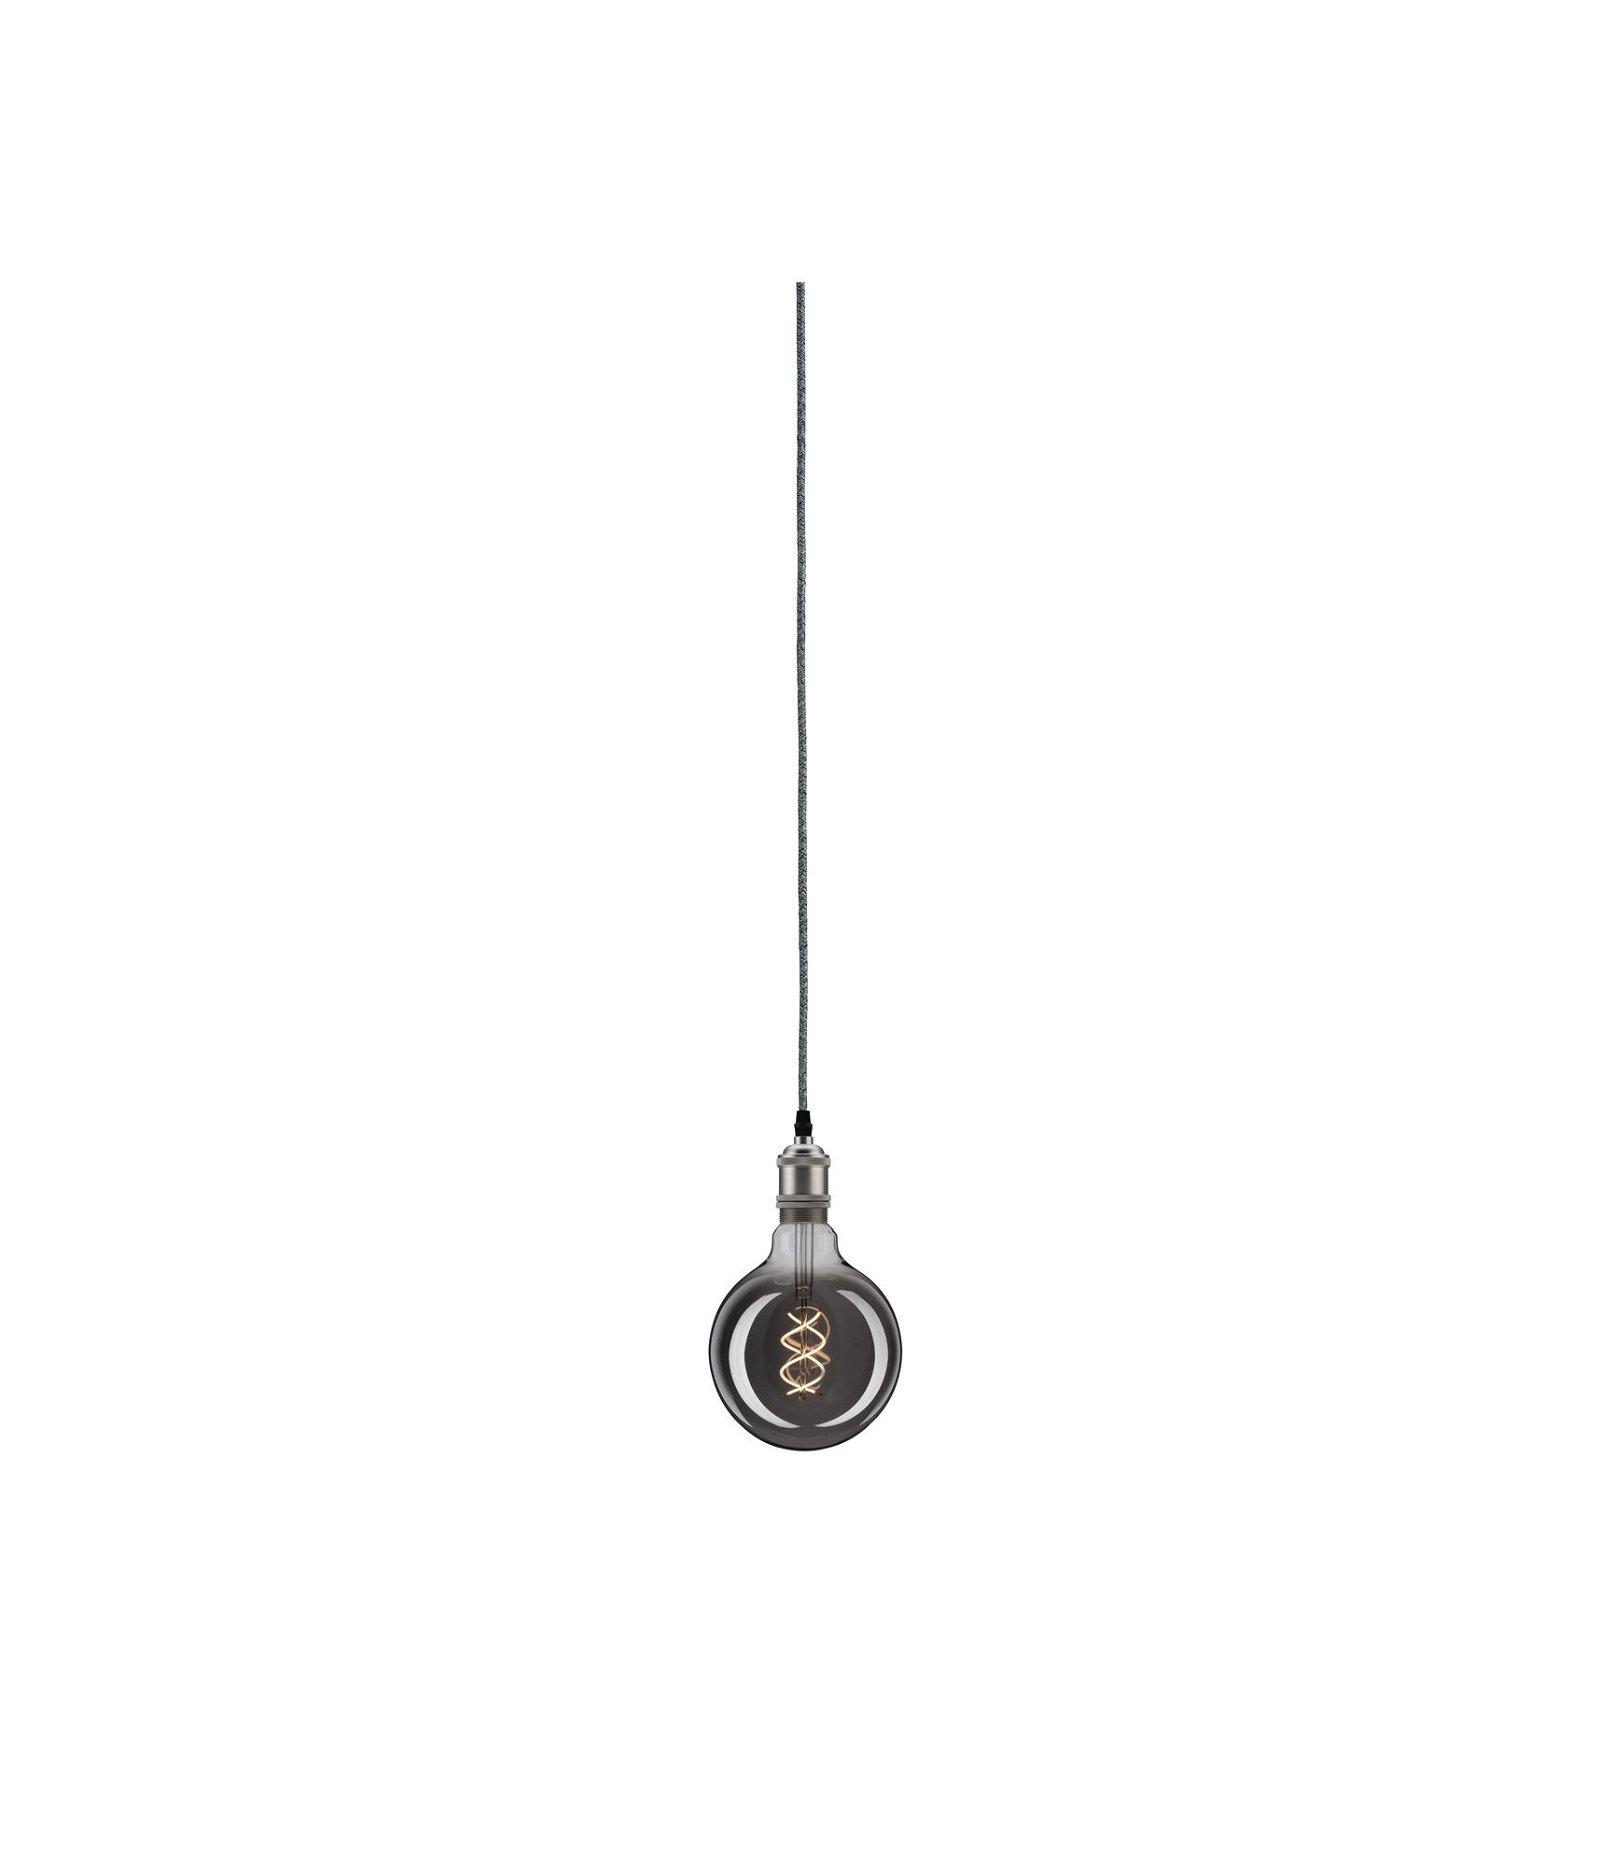 Neordic Pendelleuchte Eldar inkl. Stecker E27 max. 20W Grau/Nickel Metall